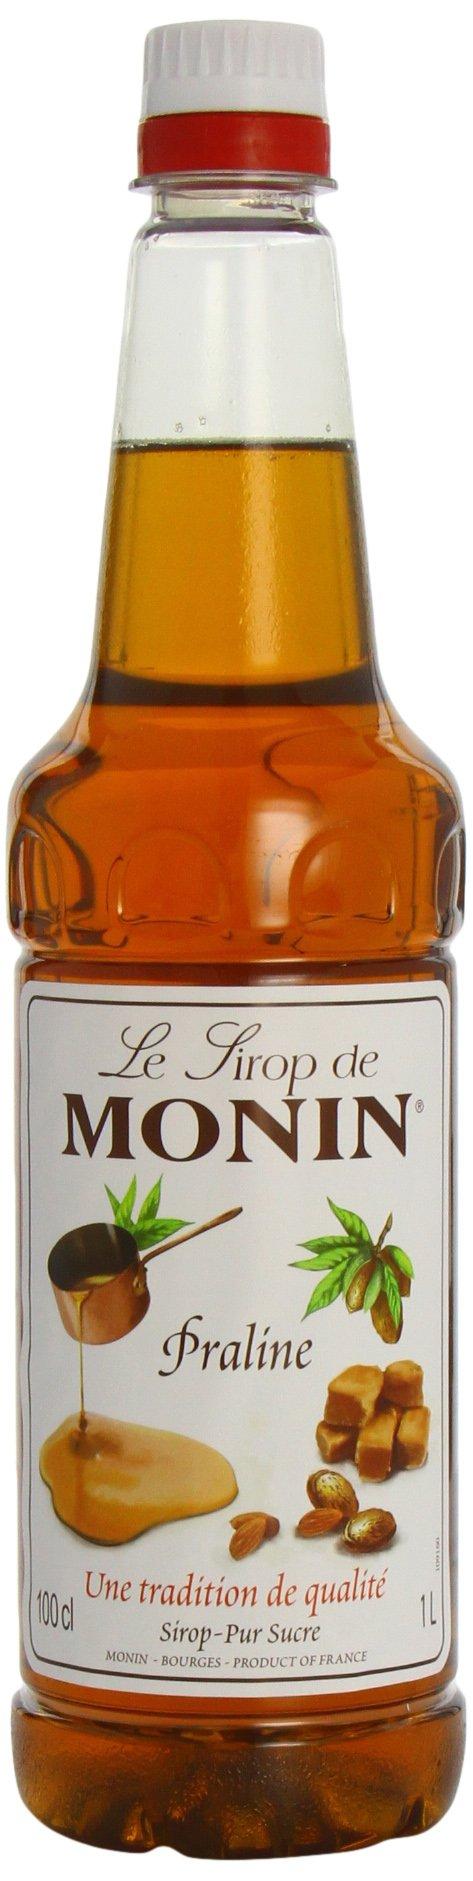 Monin-Premium-Praline-Syrup-1-L